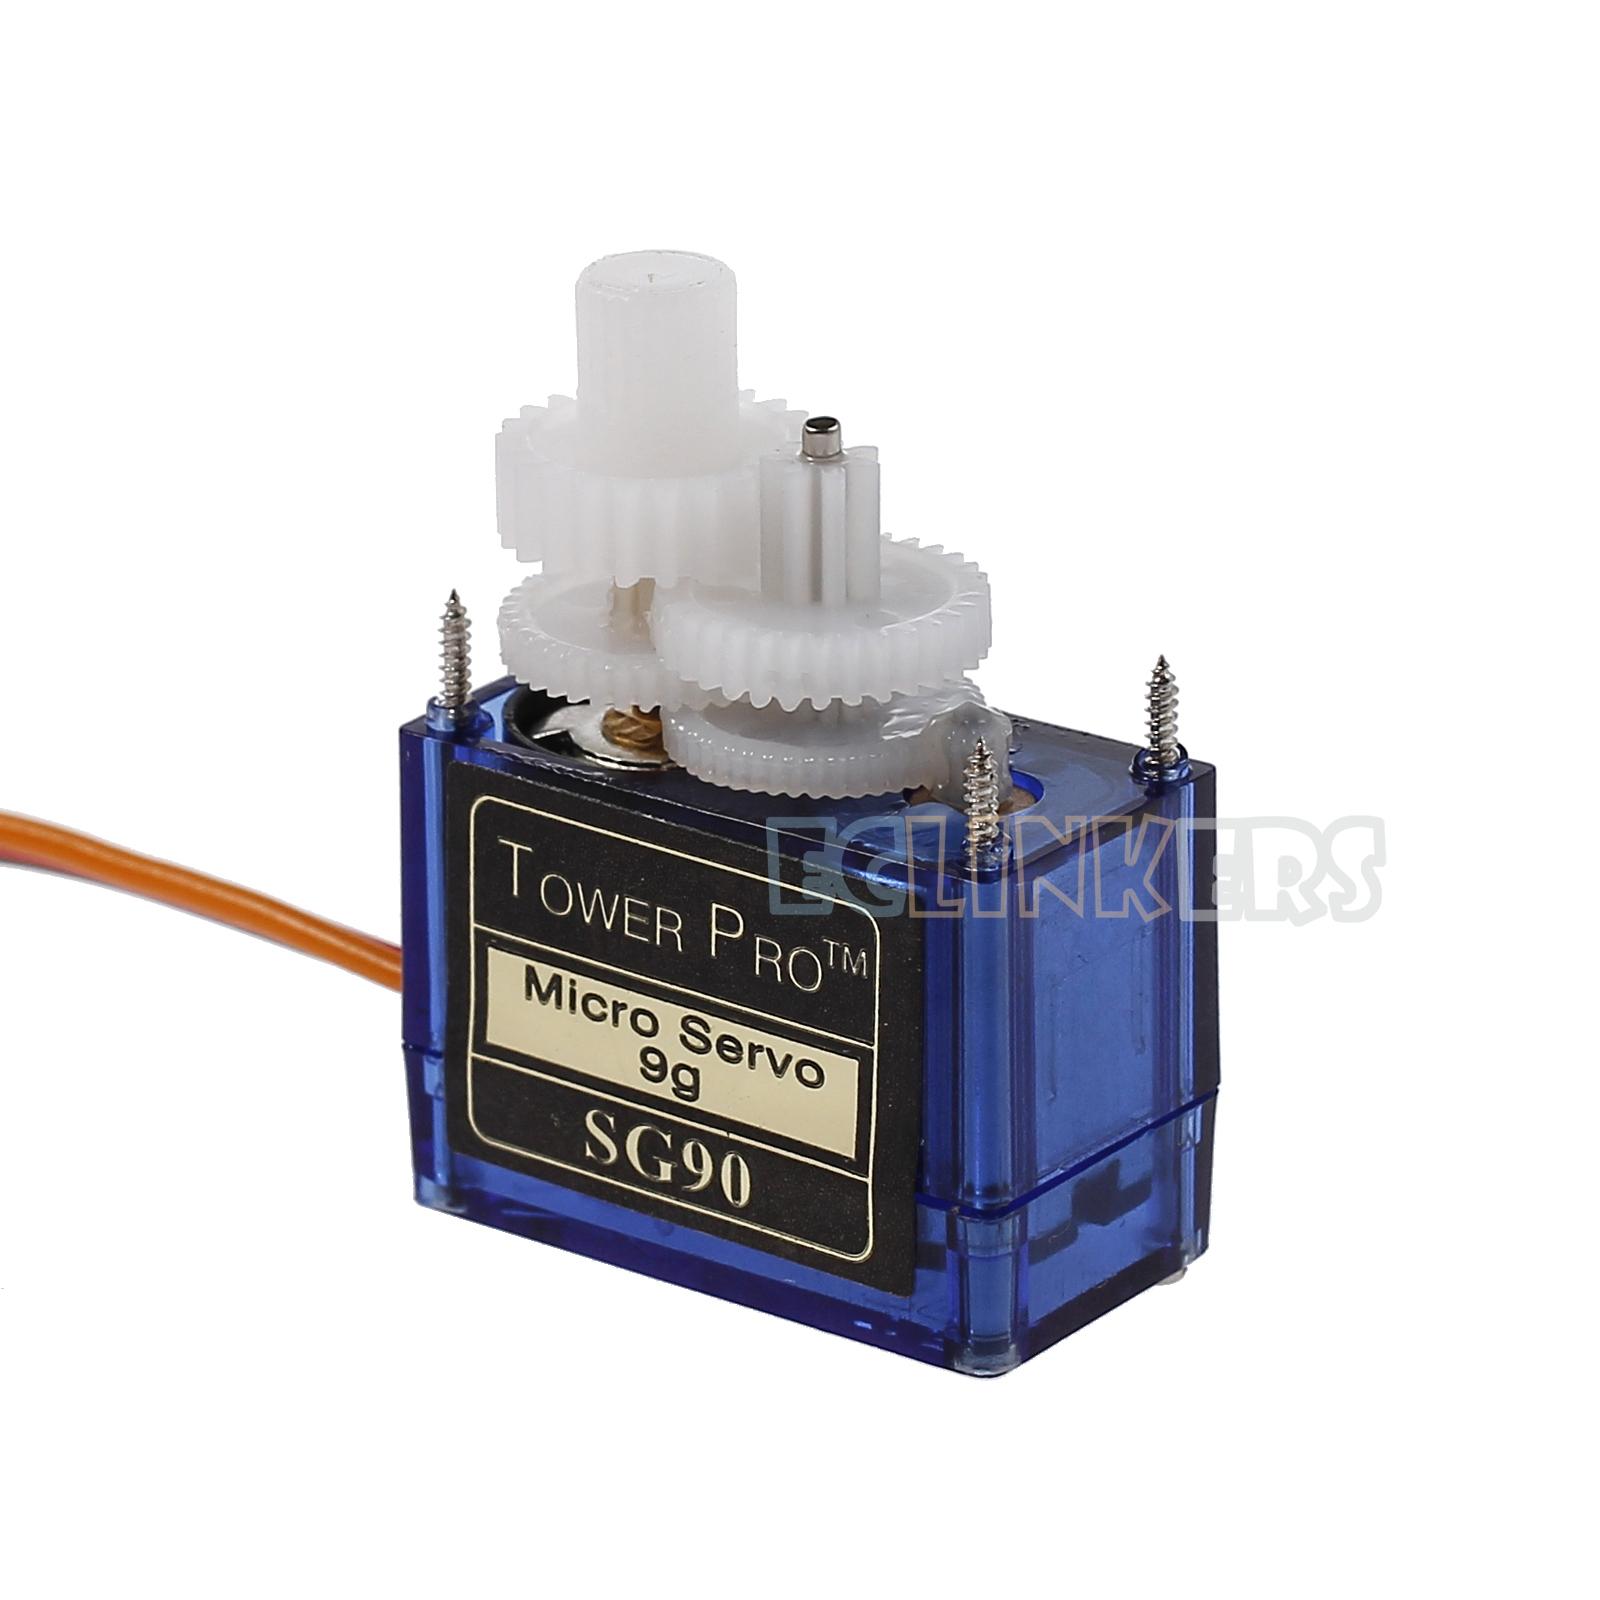 10pcs Sg90 9g Micro Servo Motor Remote Control Rc Robot